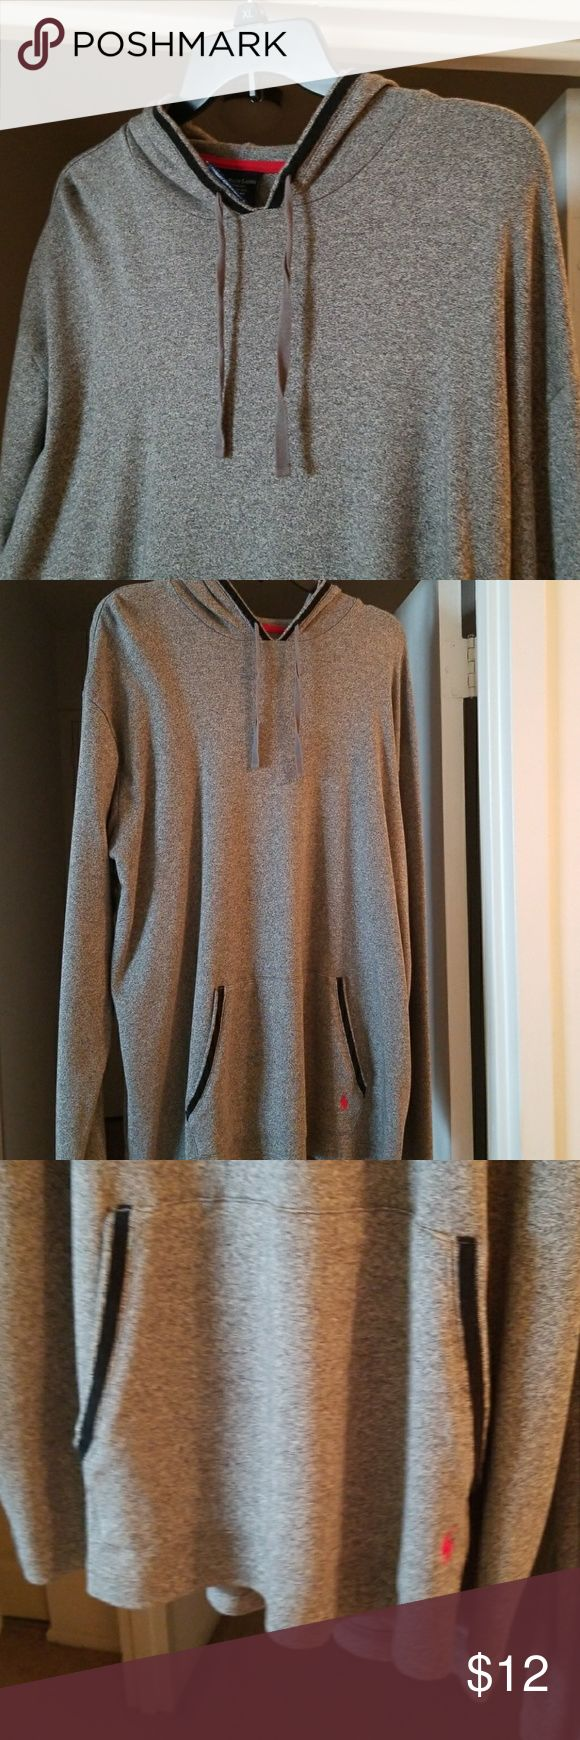 Polo sleepwear hoodie Very soft, great to lounge around the house, hoodie with pockets. XXL Polo by Ralph Lauren Shirts Sweatshirts & Hoodies